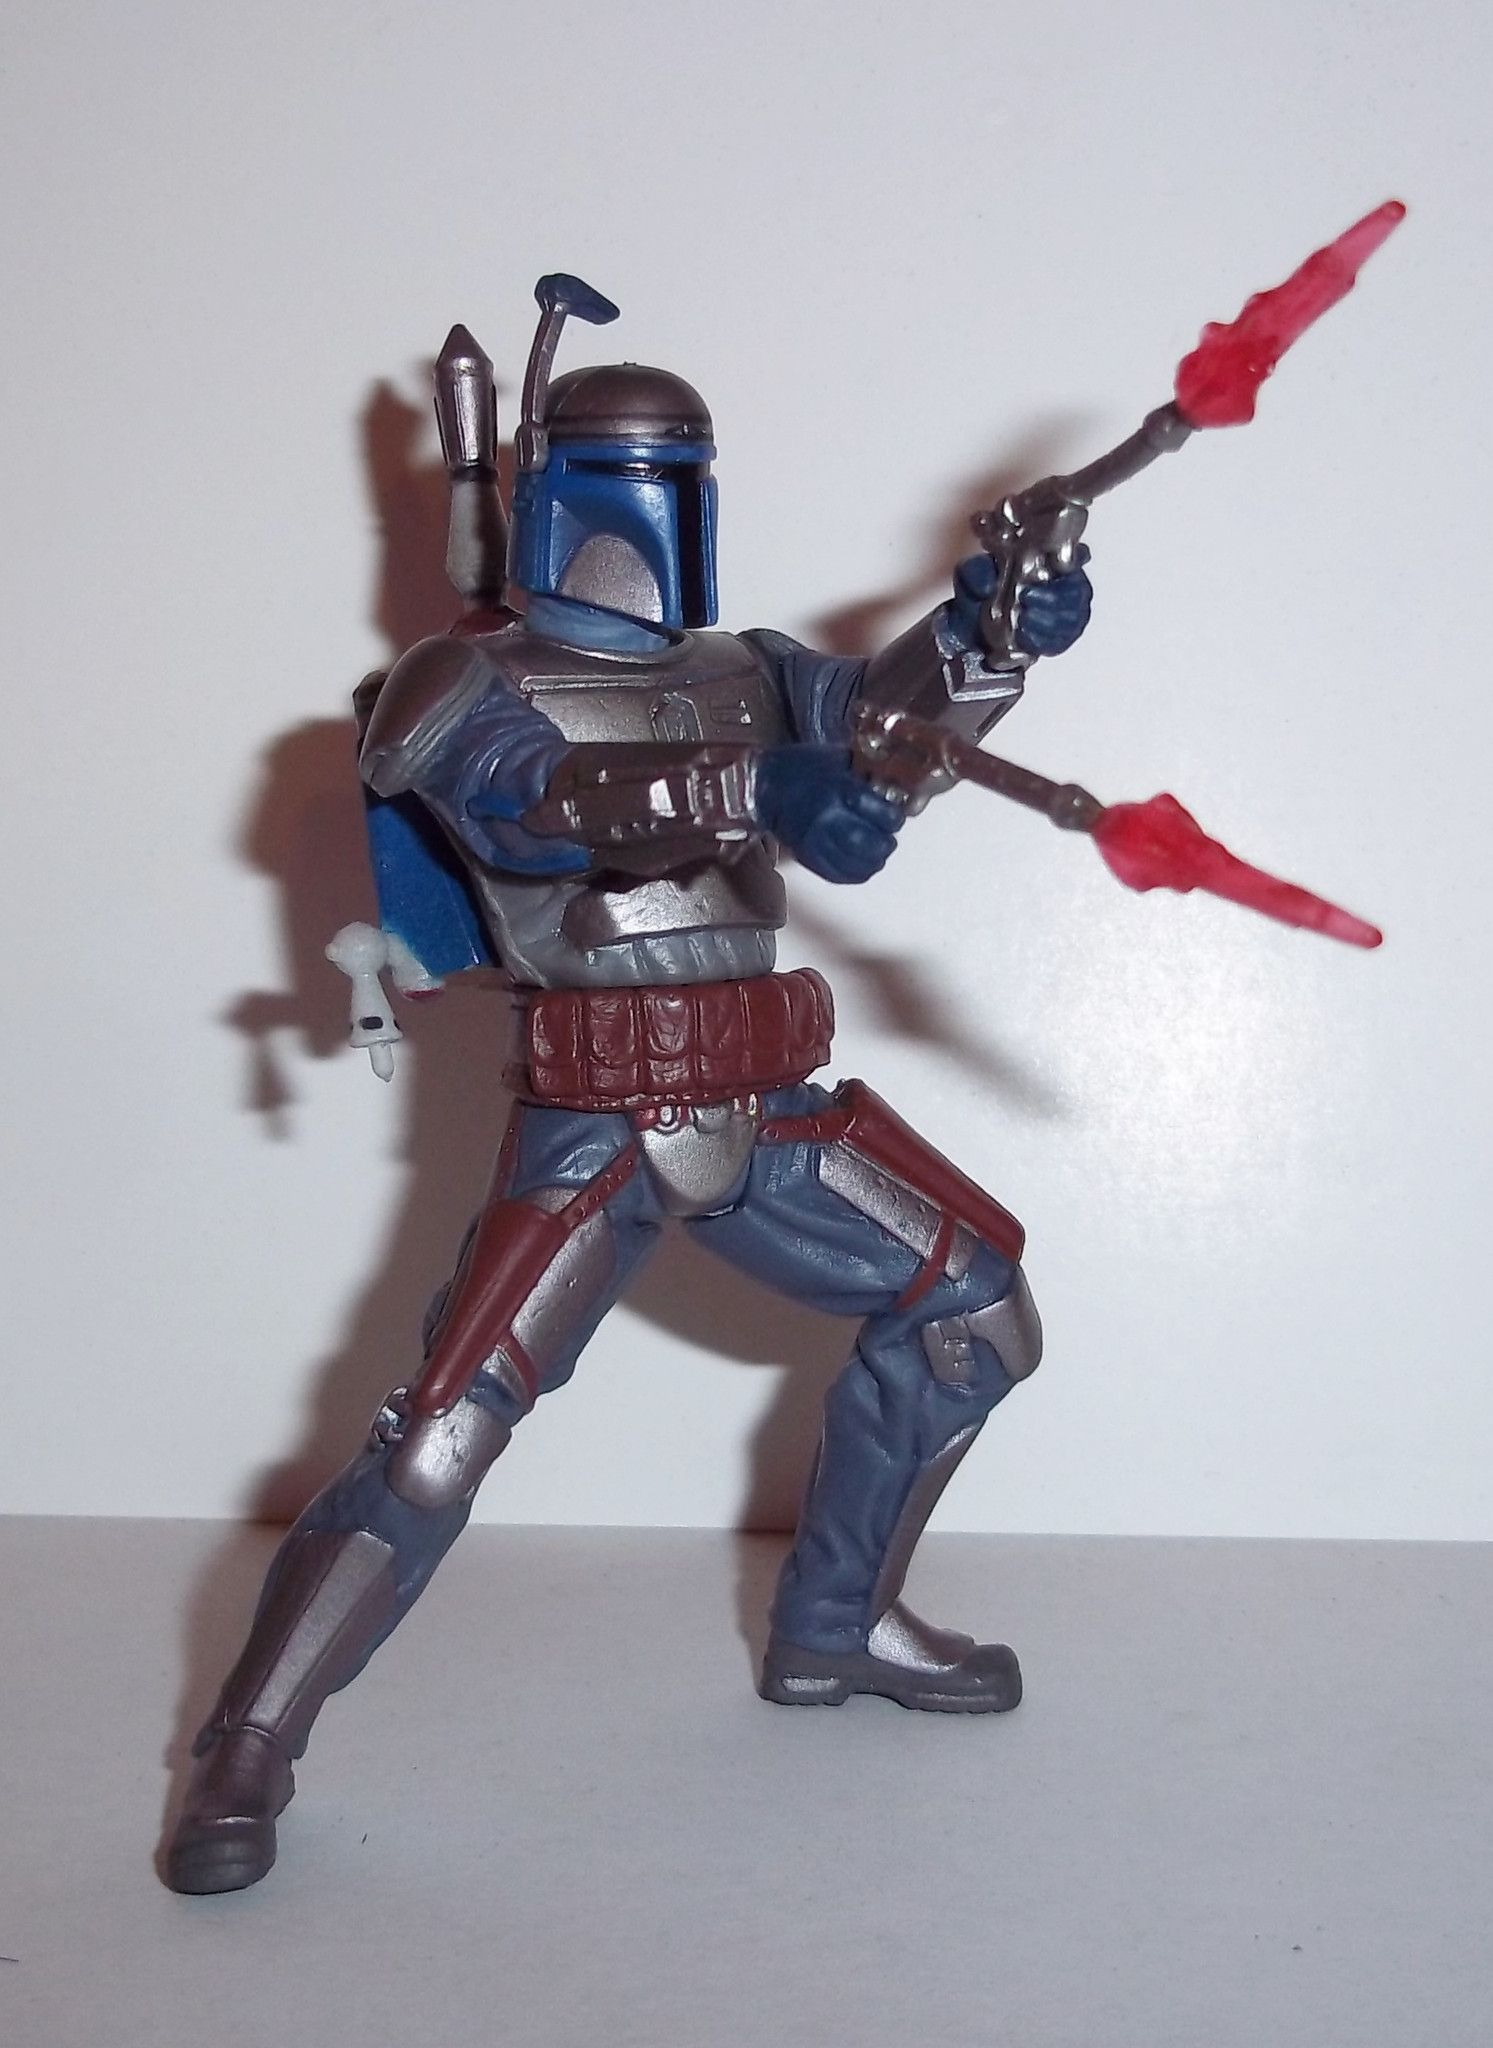 Star Wars Clone Wars Mandalorian Warrior Hasbro boba fett jango animated dark